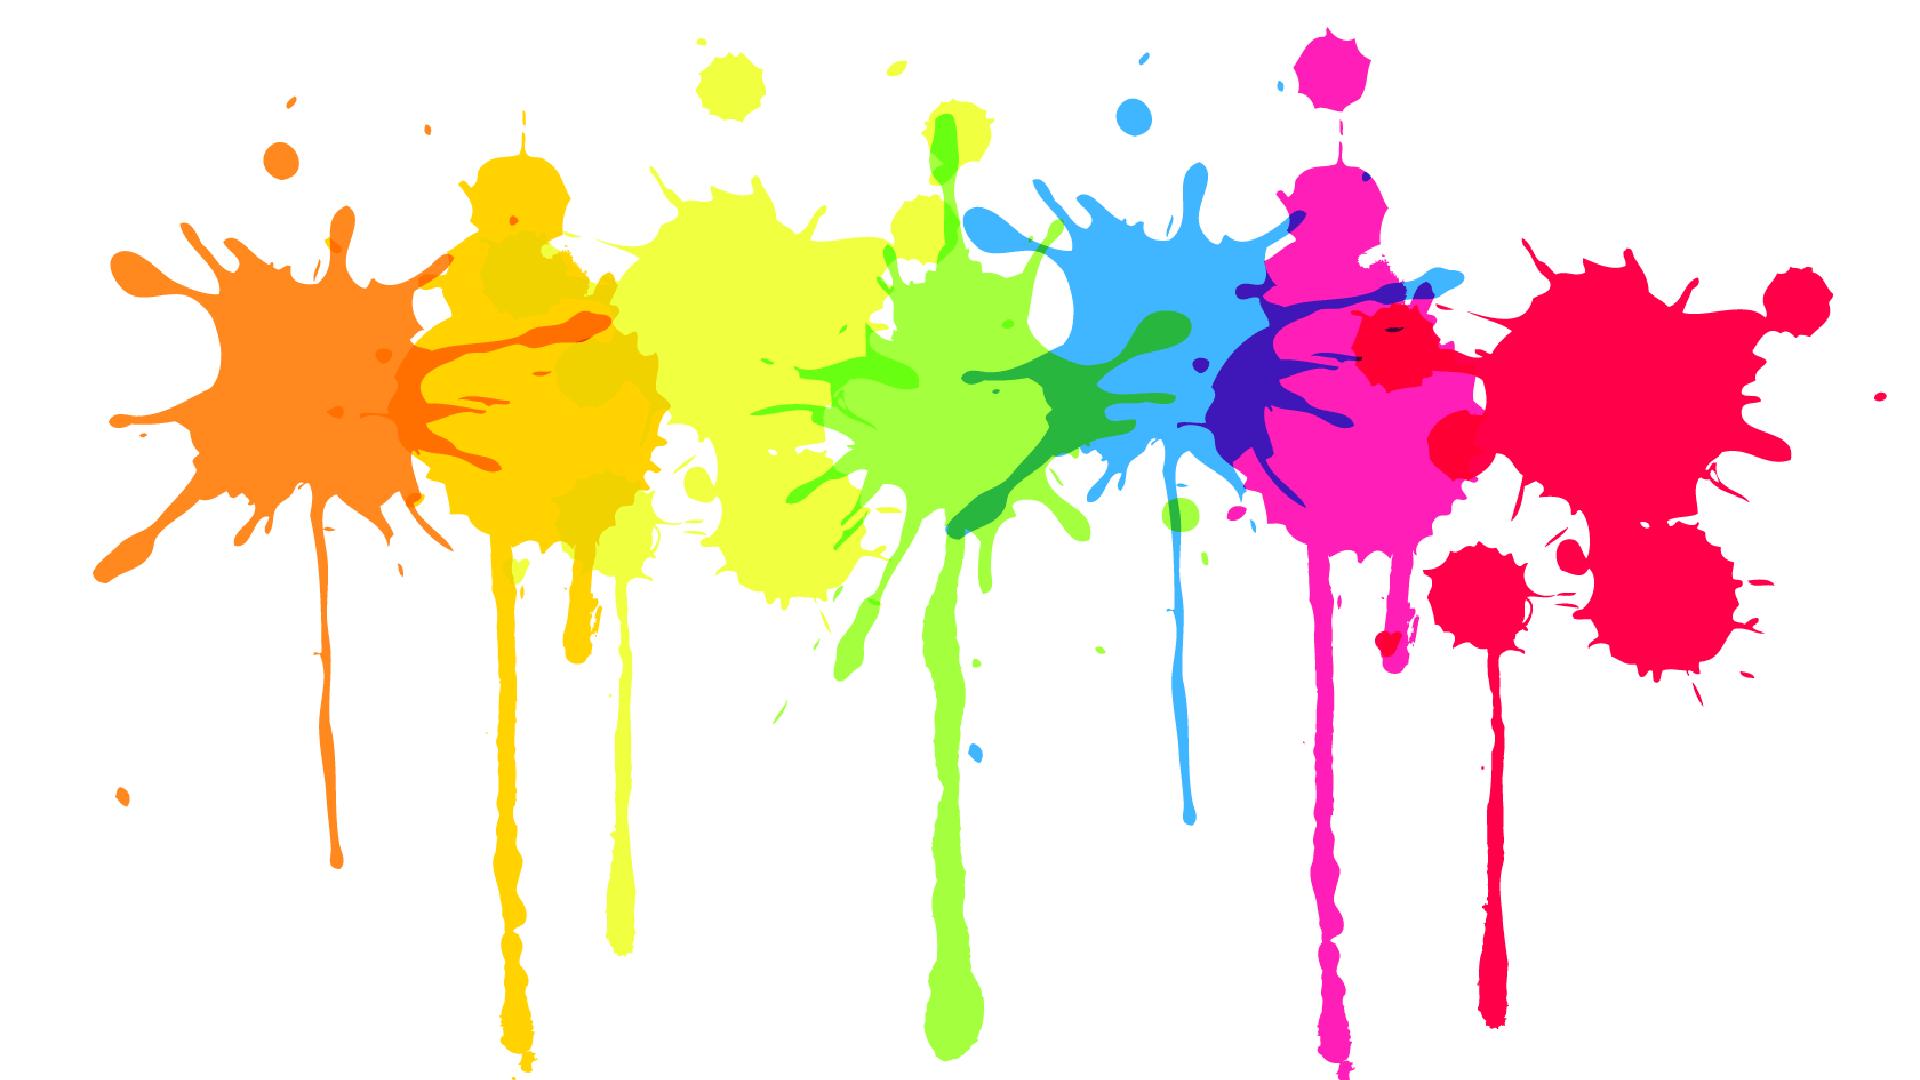 Pin By Susan Monschein On Artzy Steff Clip Art Happy Holi Paint Splatter